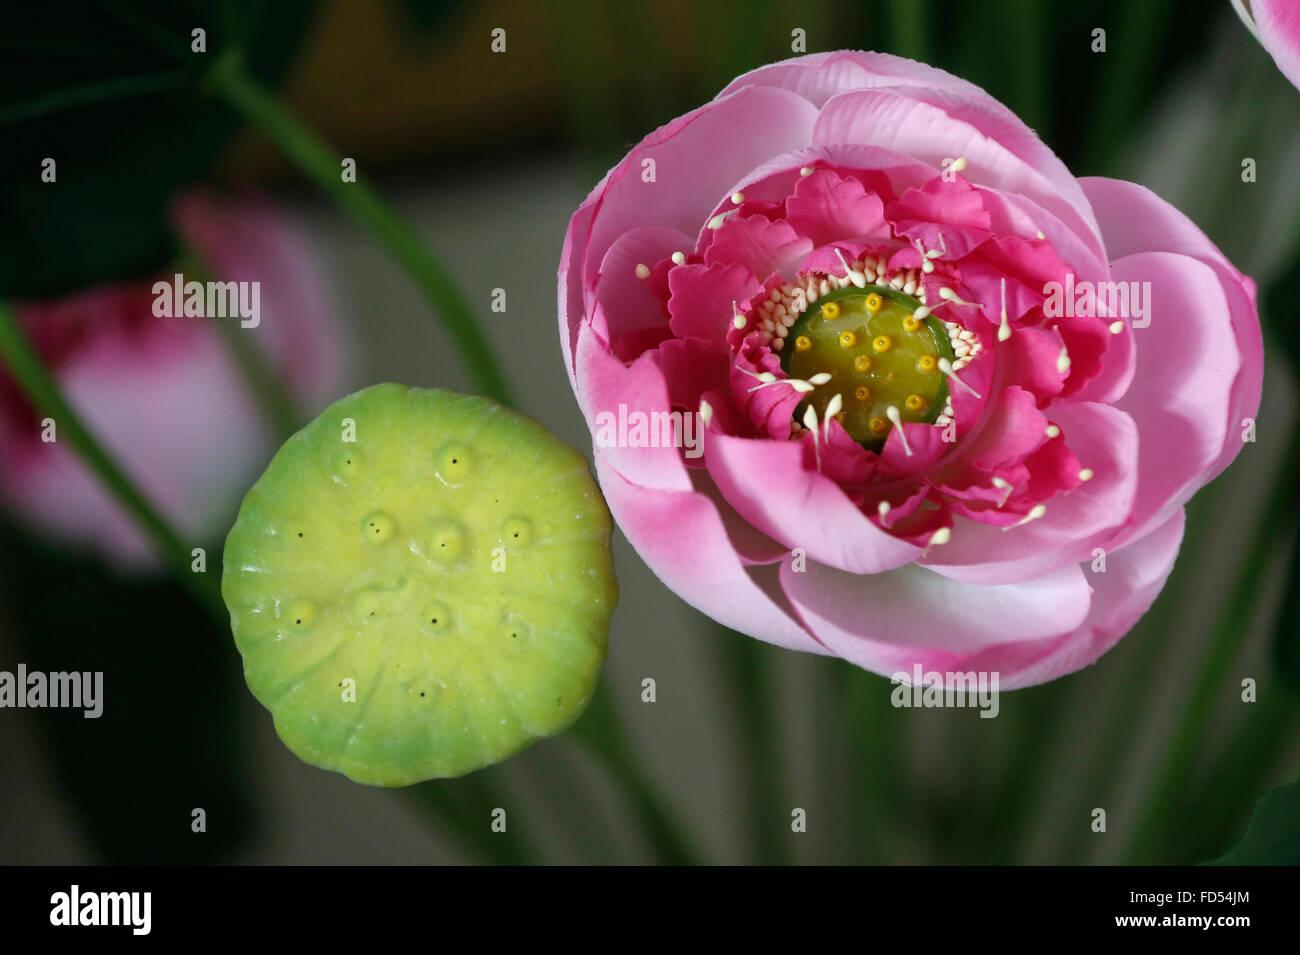 Paper Lotus Flower Stock Photo 94155788 Alamy